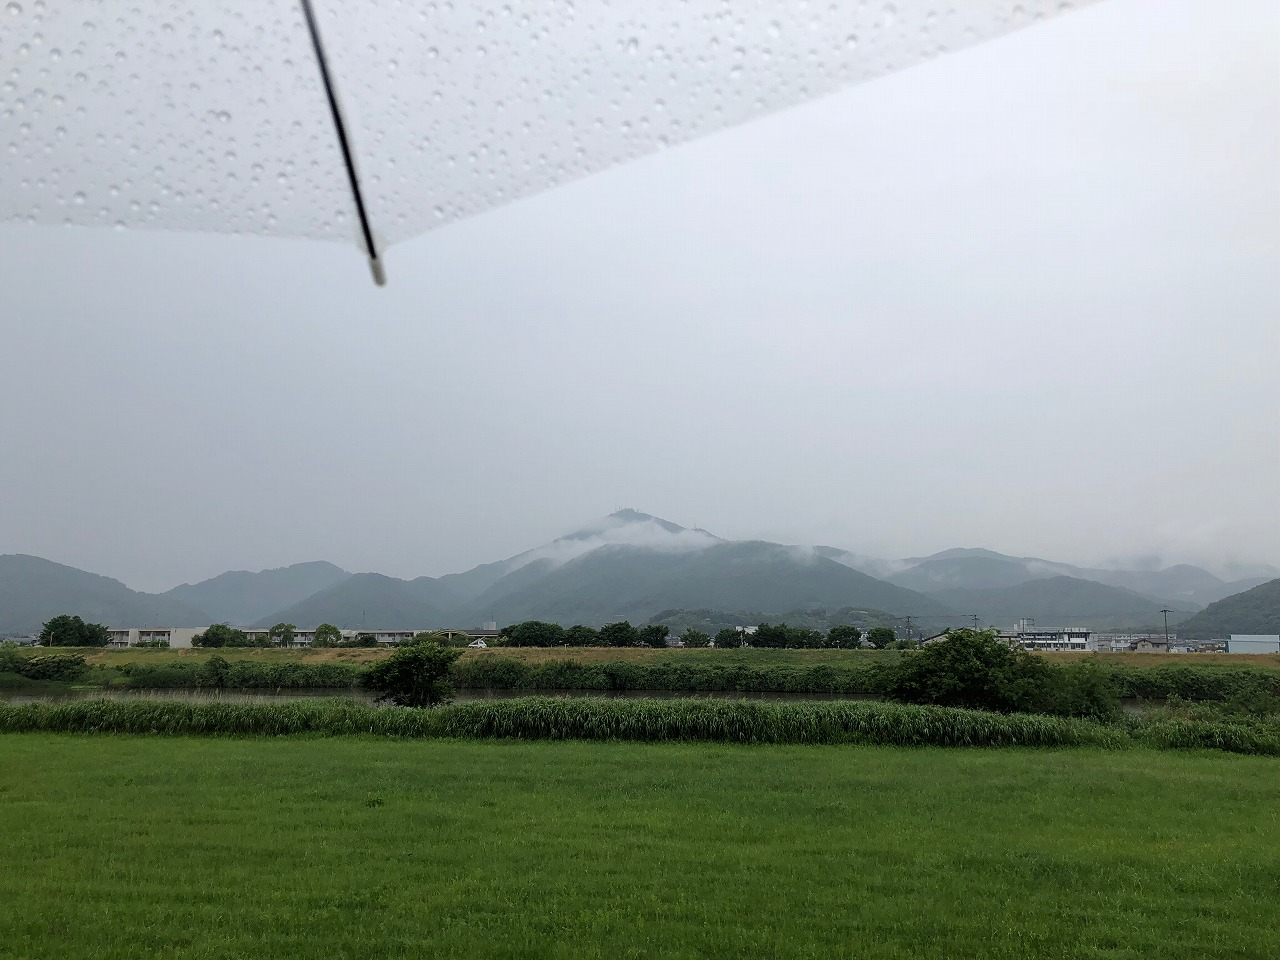 2018.5.31今朝の金峰山